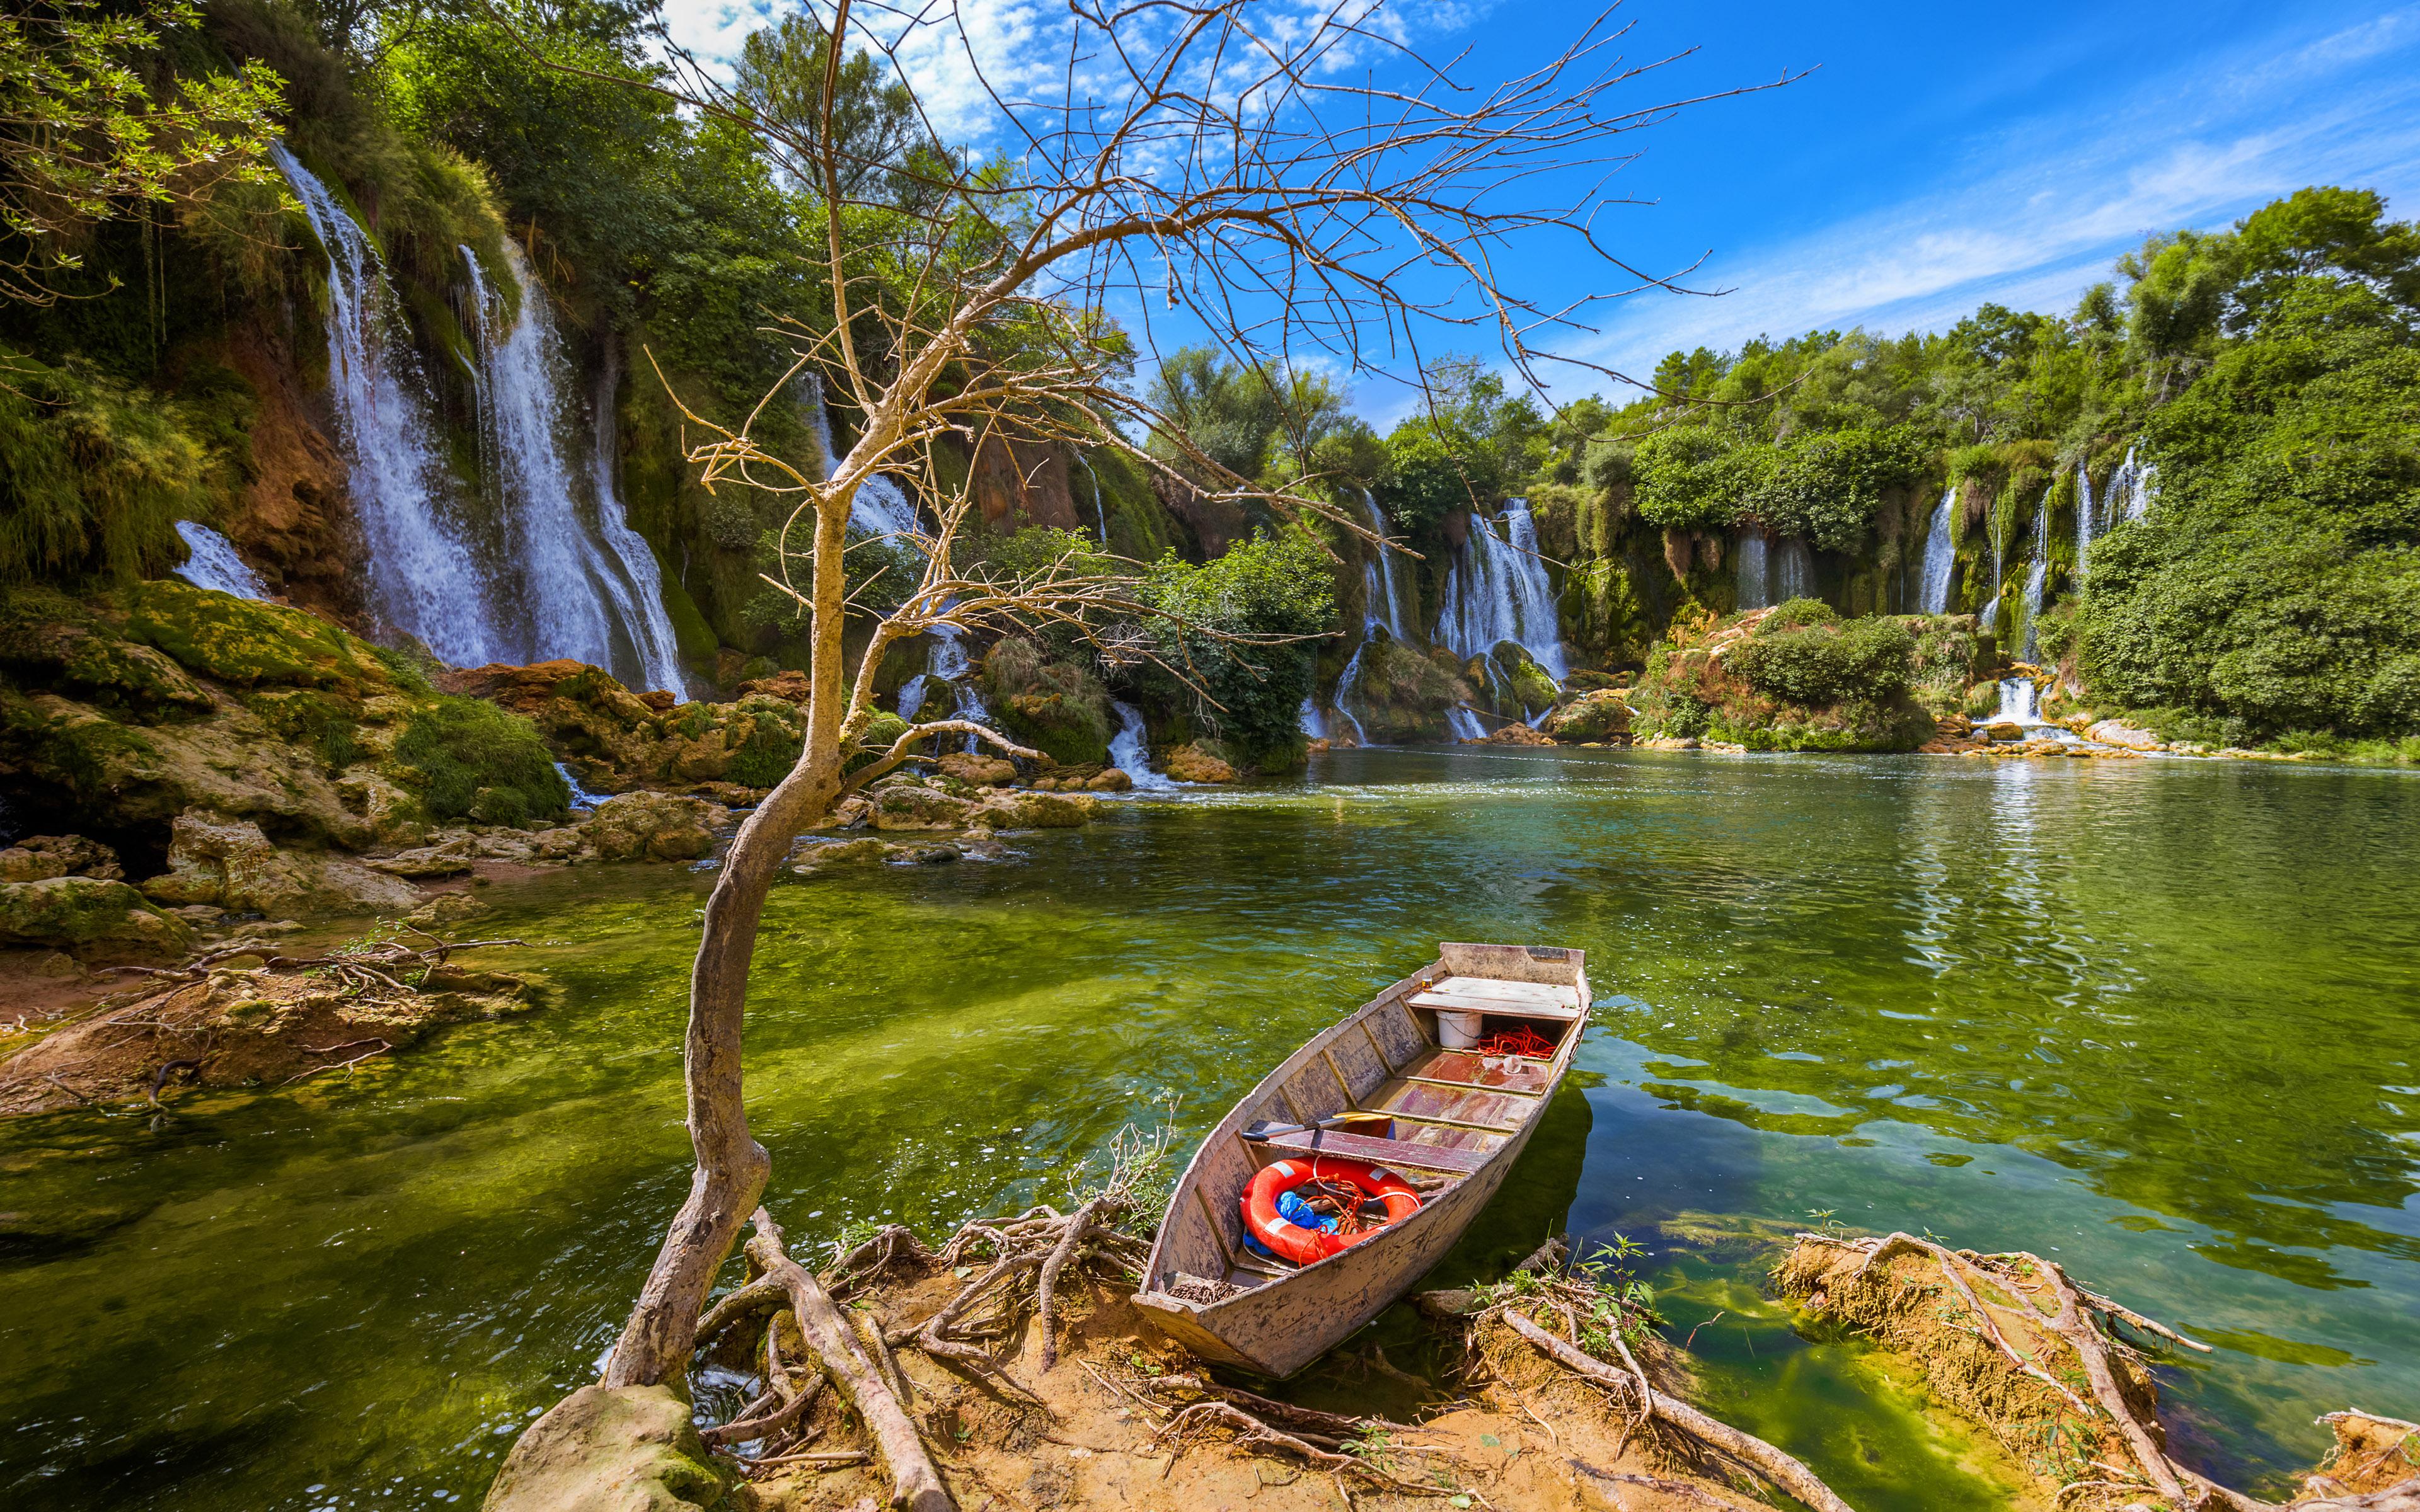 Niagara Water Falls Desktop Wallpaper Waterfall Kravice In Bosnia And Herzegovina Beautiful